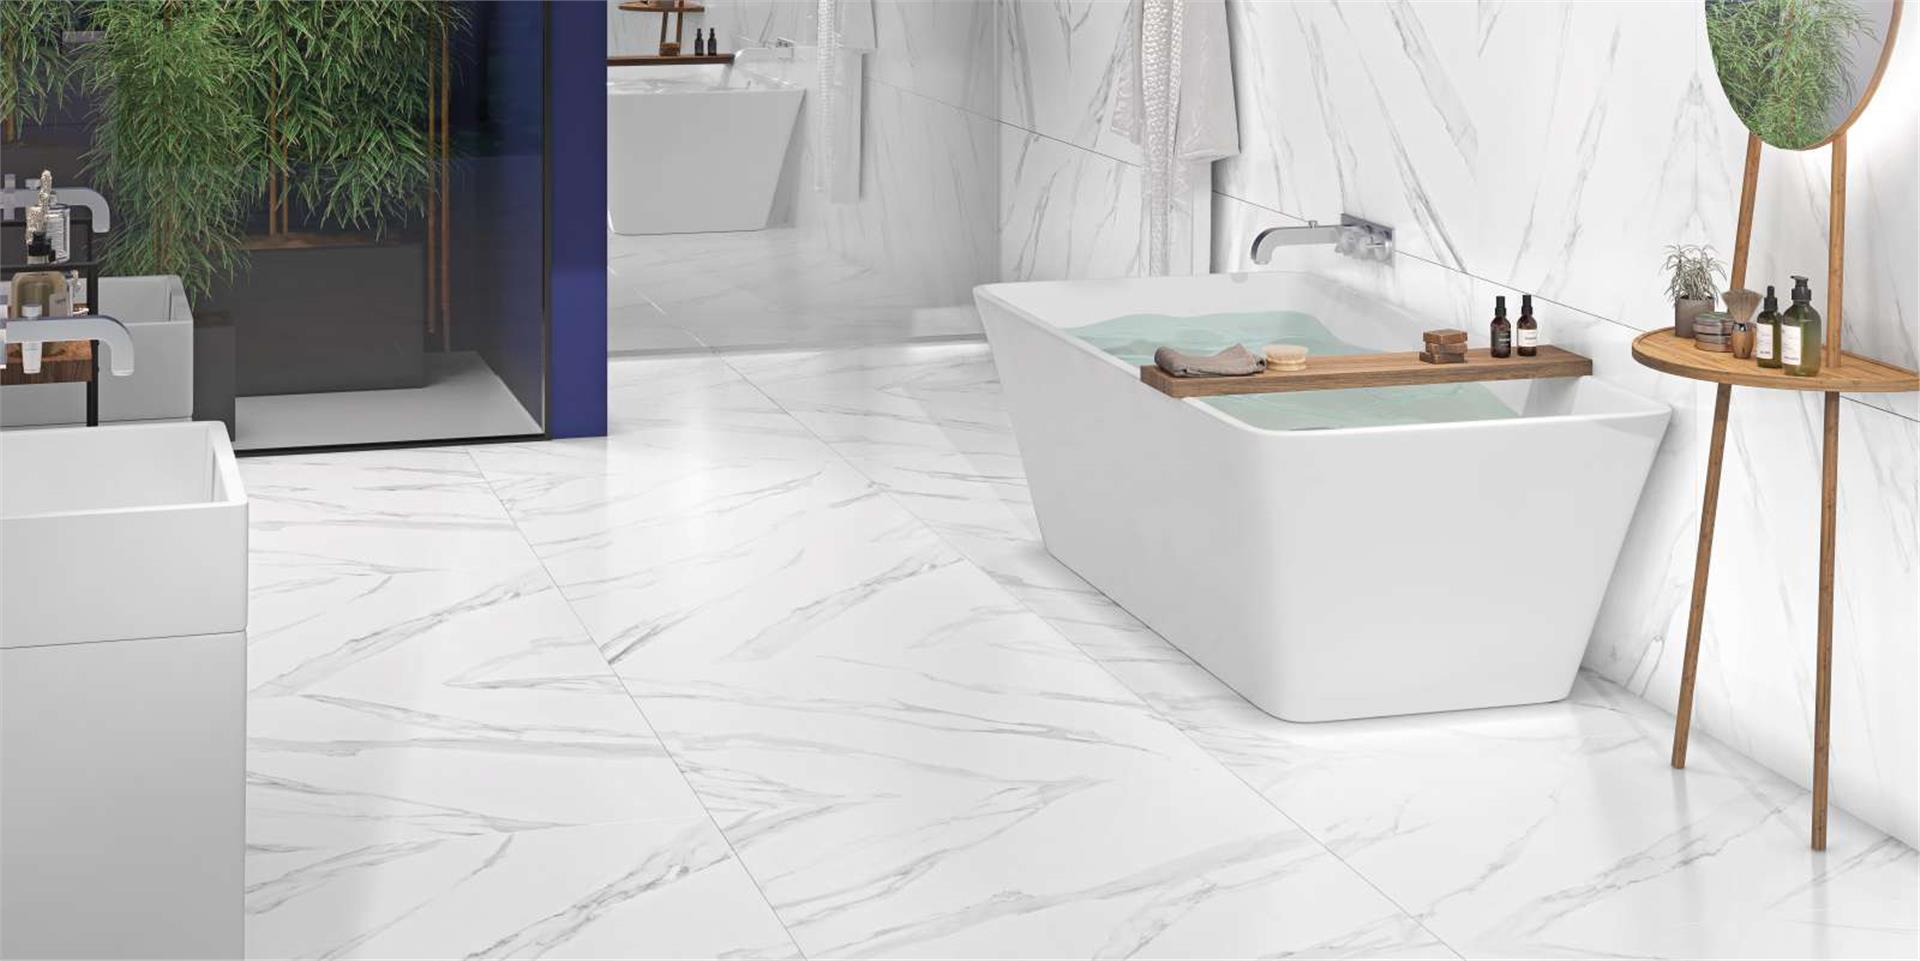 Villagres Porcelanato 90,5X90,5 Bianco Carrara Polido Ref 910021 (CX 1,64M2)